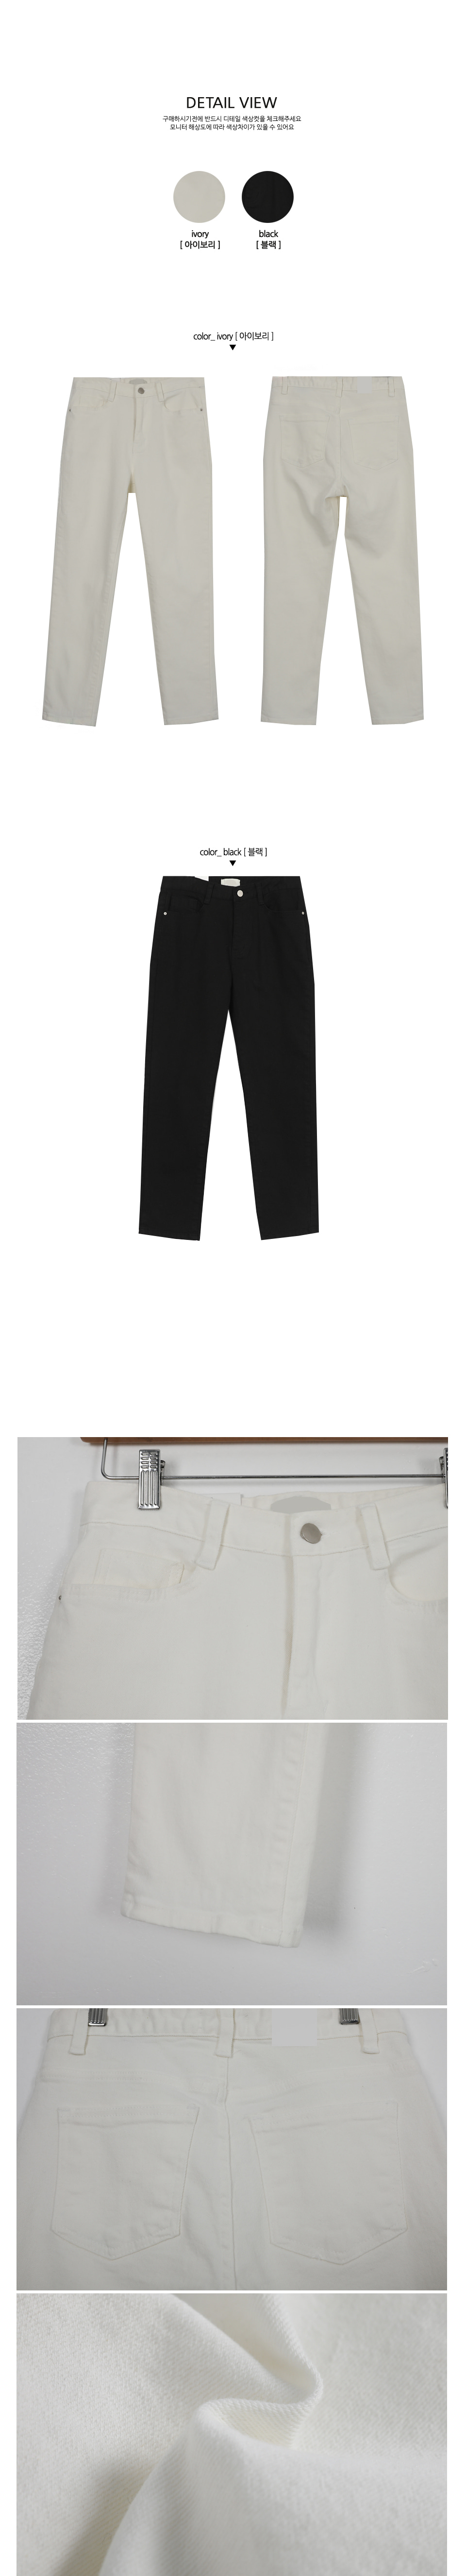 Ardel pants